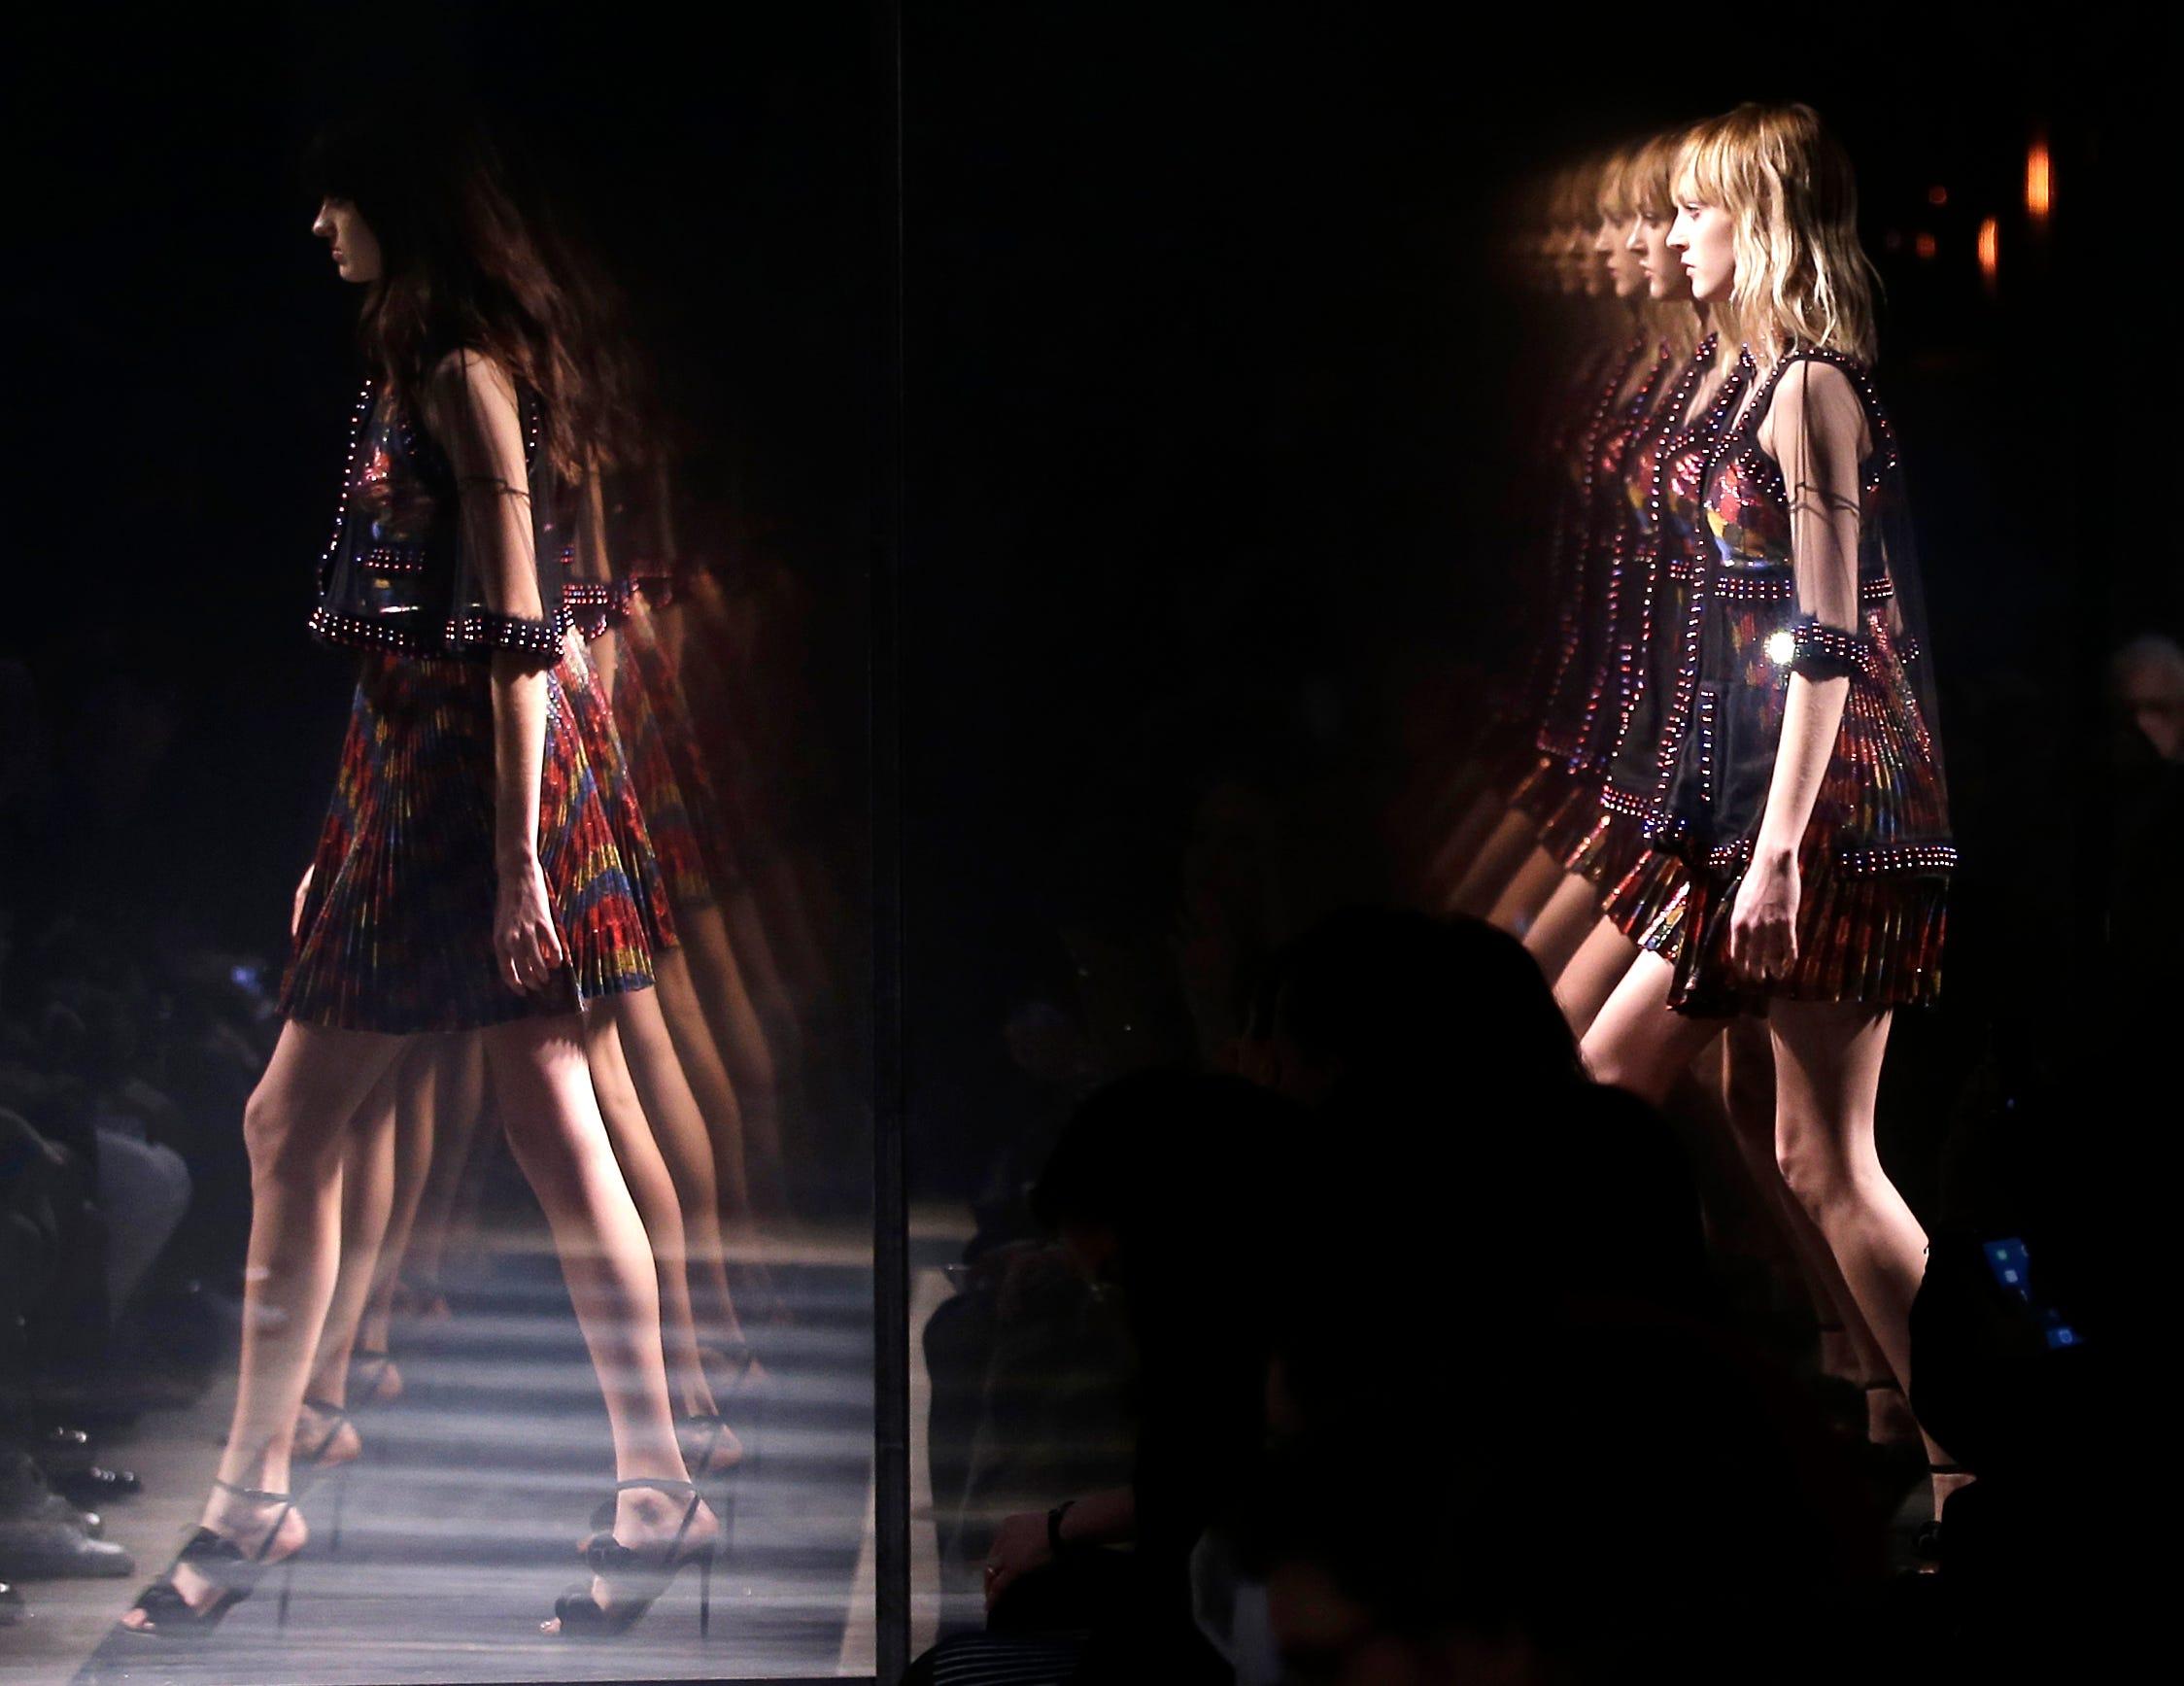 635607076320821671-APTOPIX-Italy-Fashion-Marco-De -Vincenzo-nyang-sheboygan-press.com-7.jpg